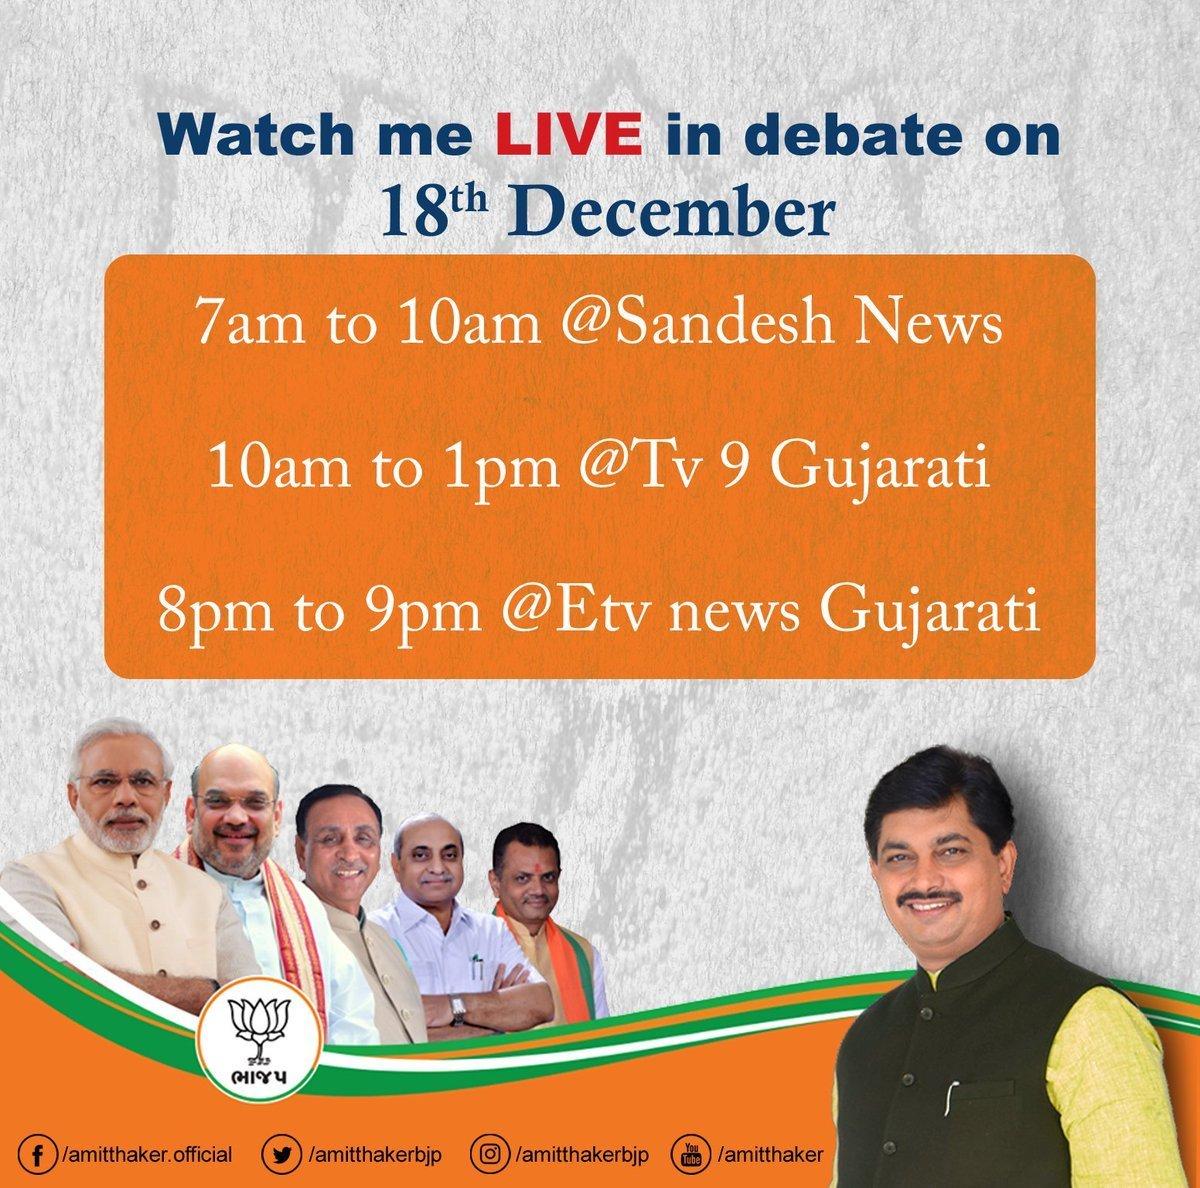 Watch me Live on Debate on 18 th December   Let